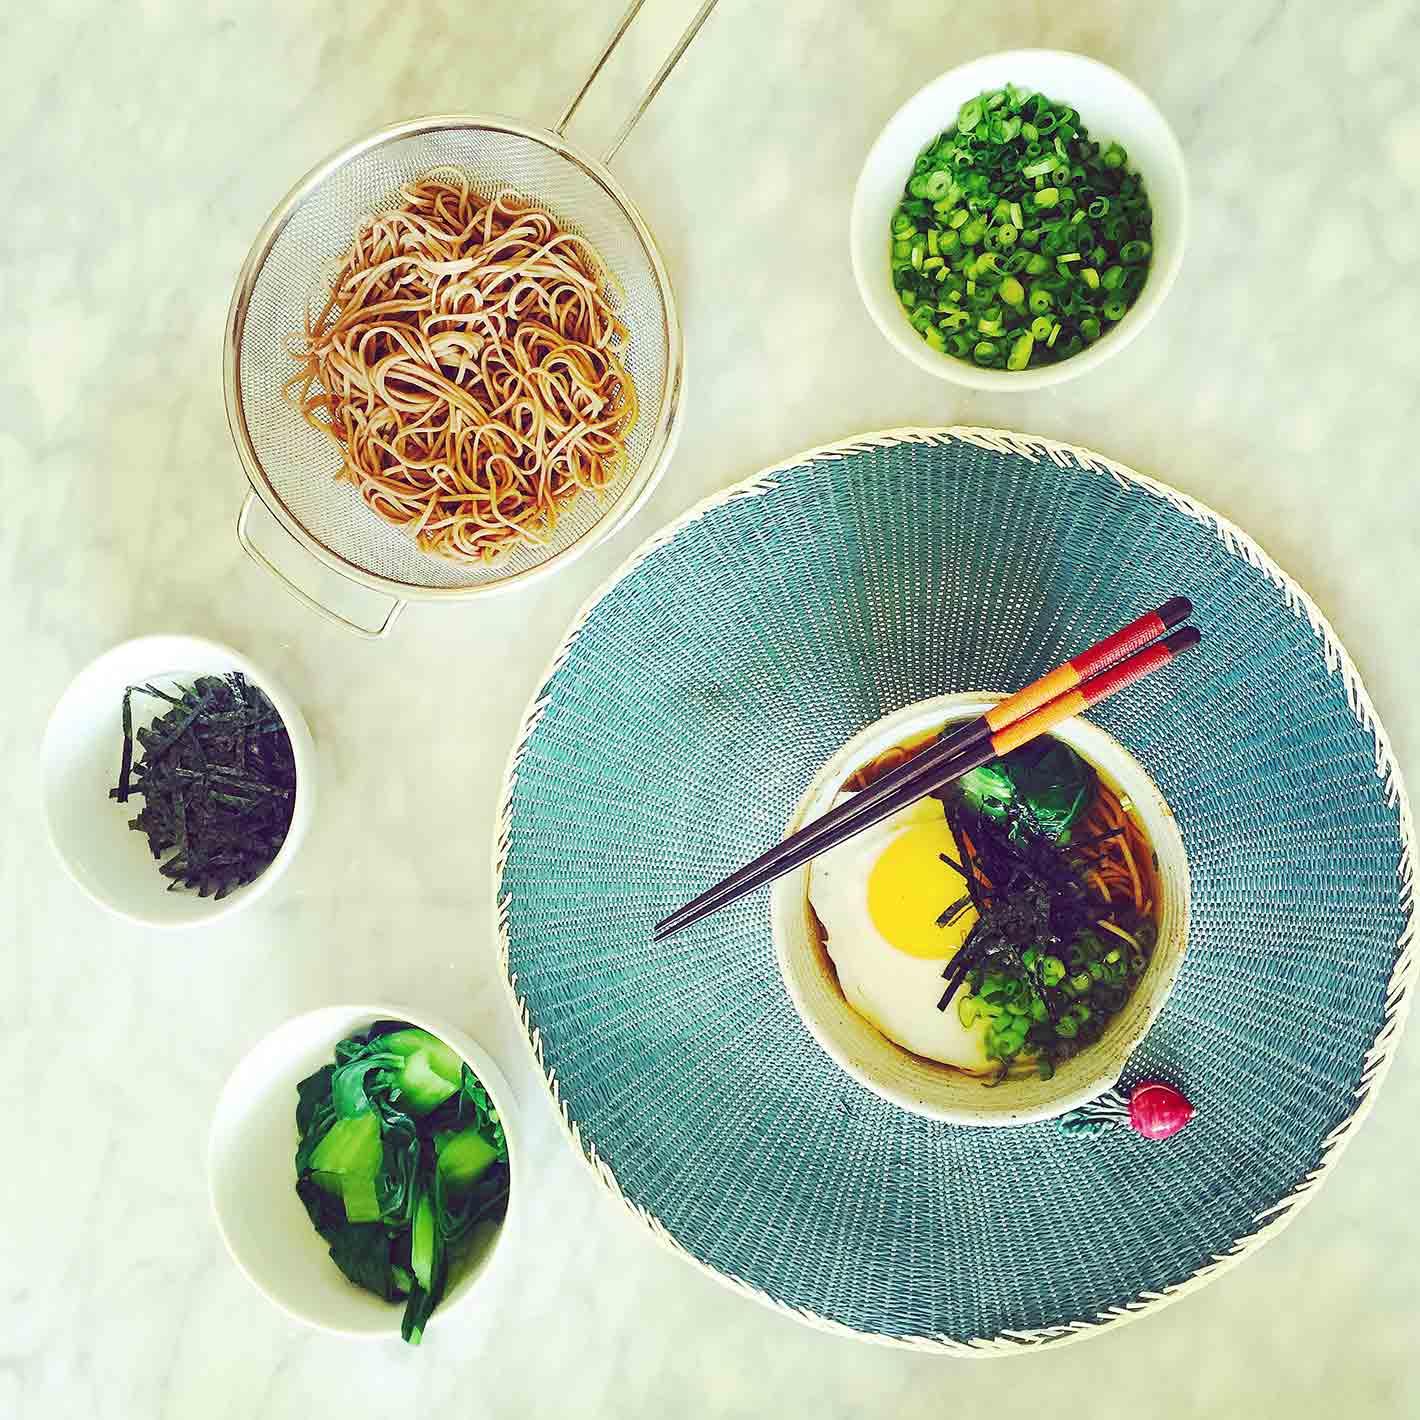 Superfood Recipes - Soba Noodles